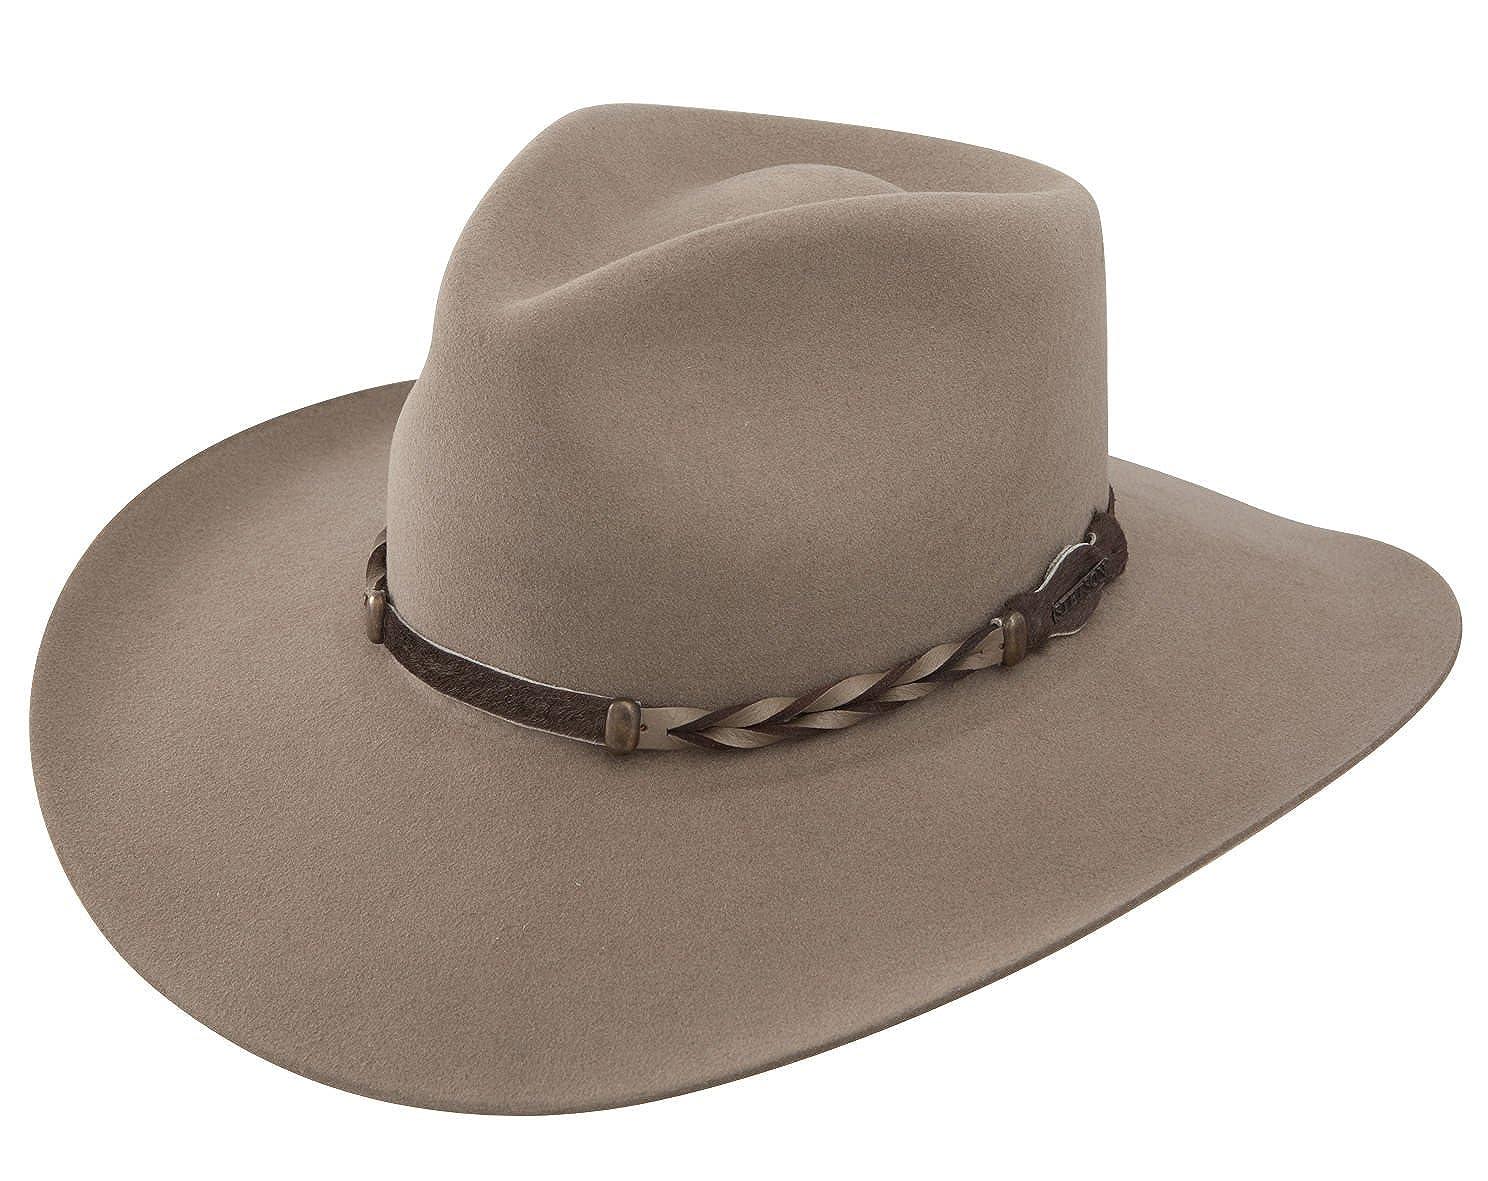 Stetson Men s 4X Drifter Buffalo Felt Pinch Front Cowboy Hat at Amazon  Men s Clothing store  Sombreros Vaqueros a69e507a47f